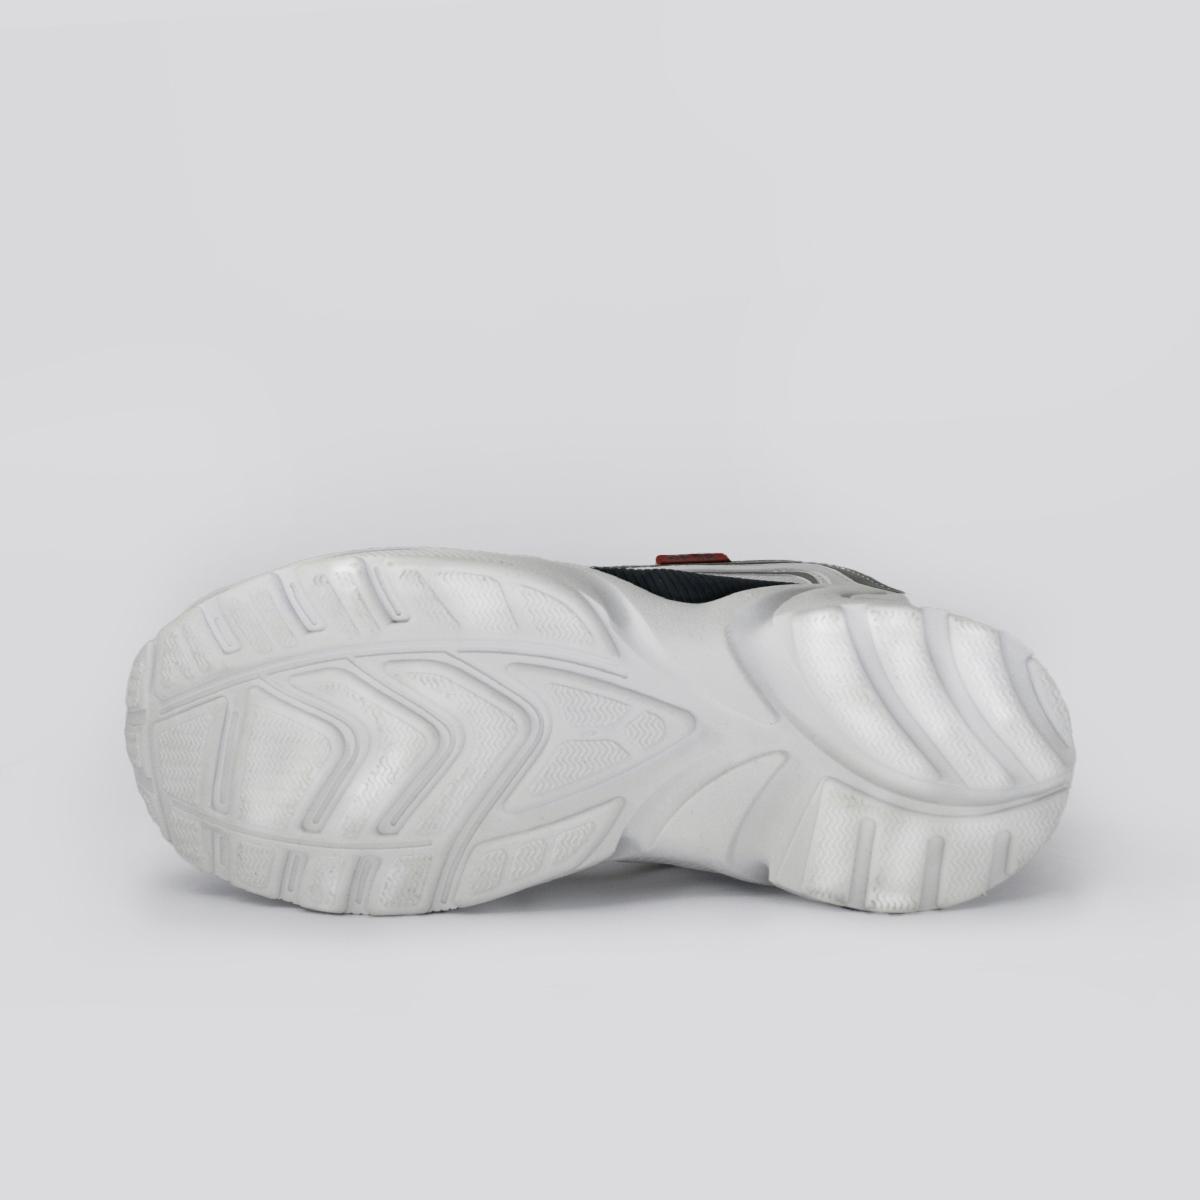 Tênis Casual Masculino Nesk Dry II Branco Marinho